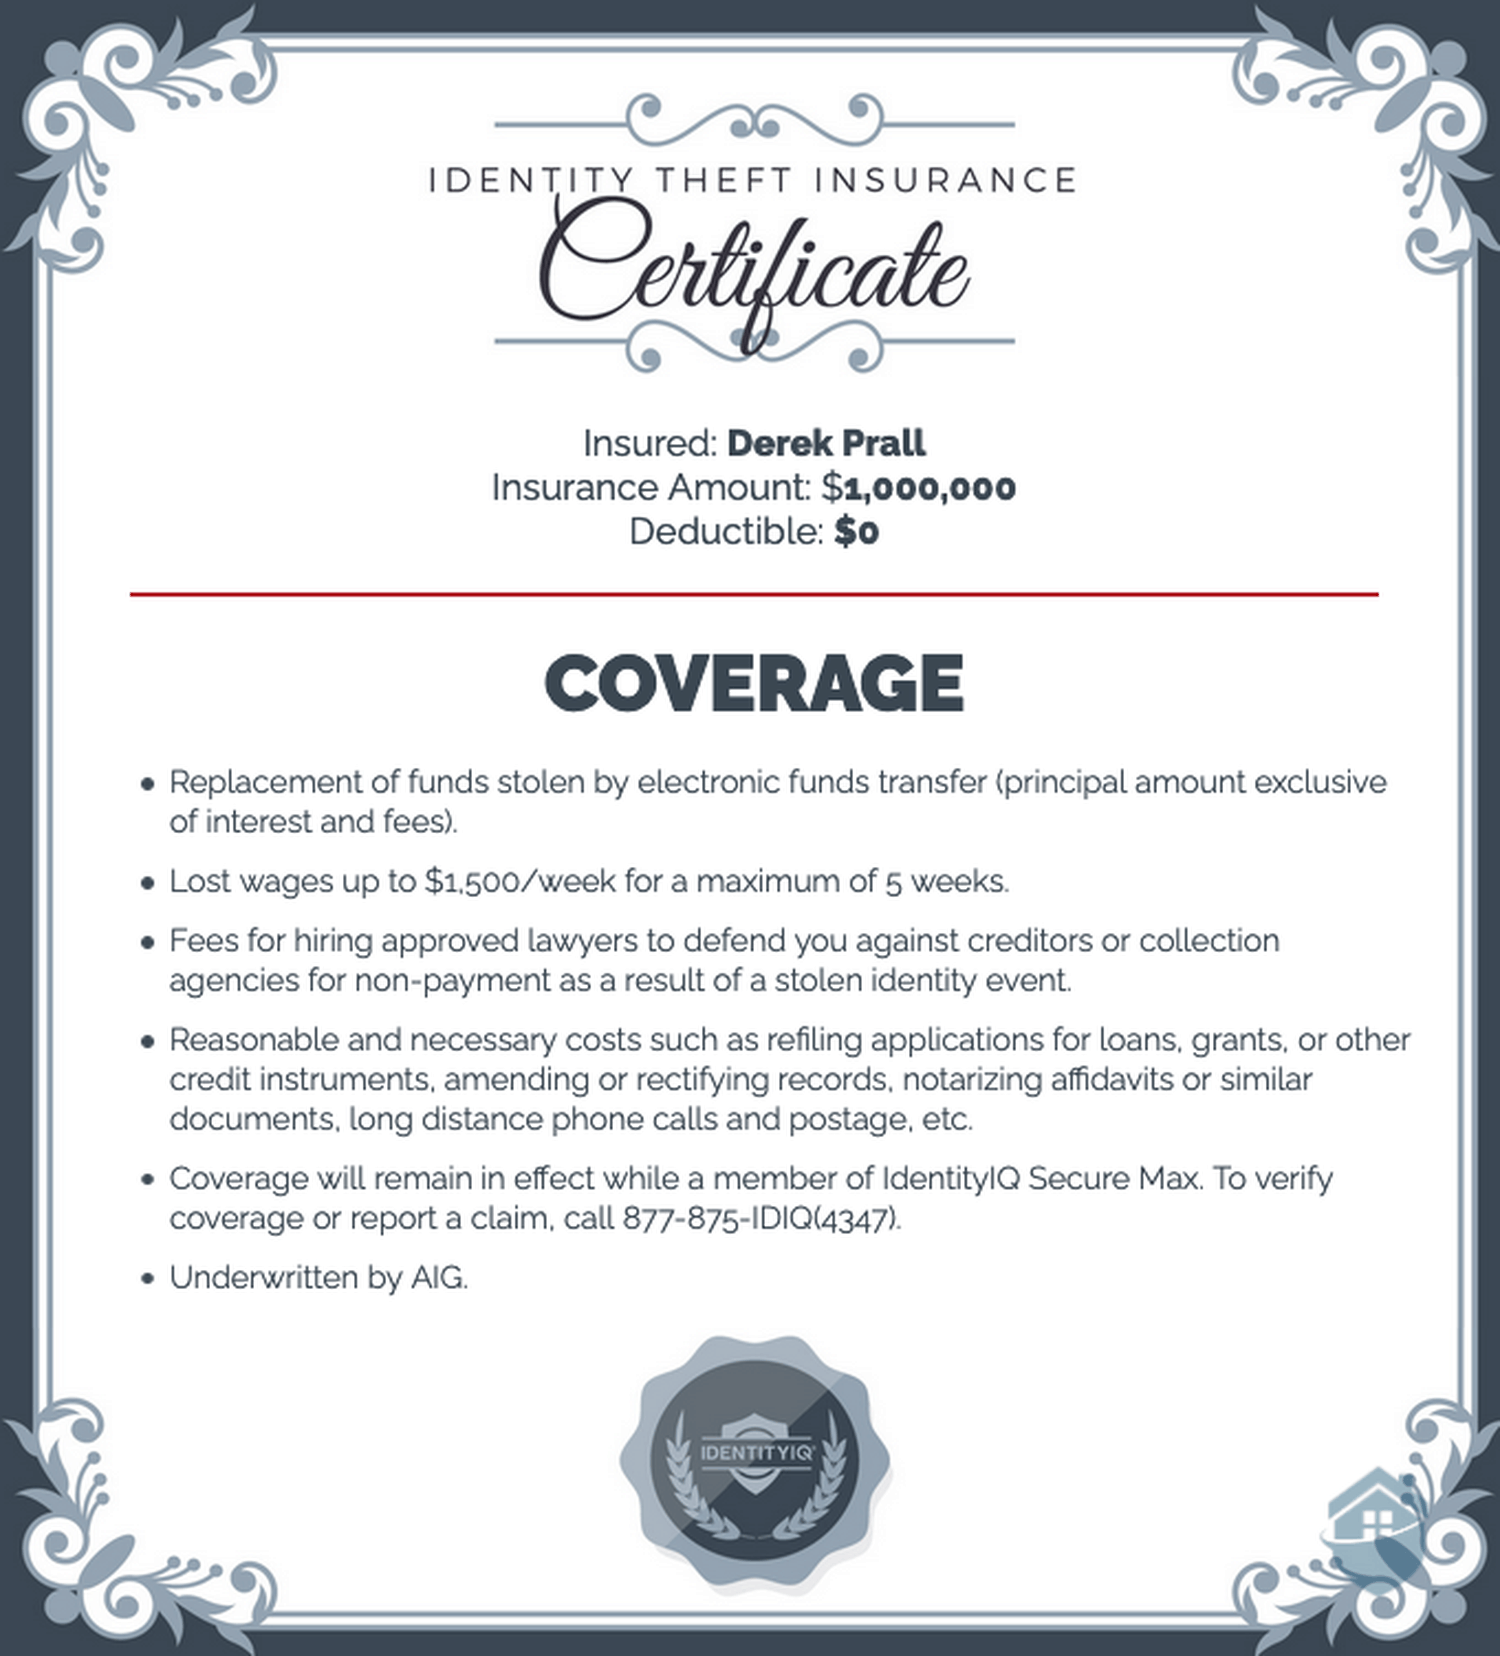 IdentityIQ Identity Theft Insurance Certificate